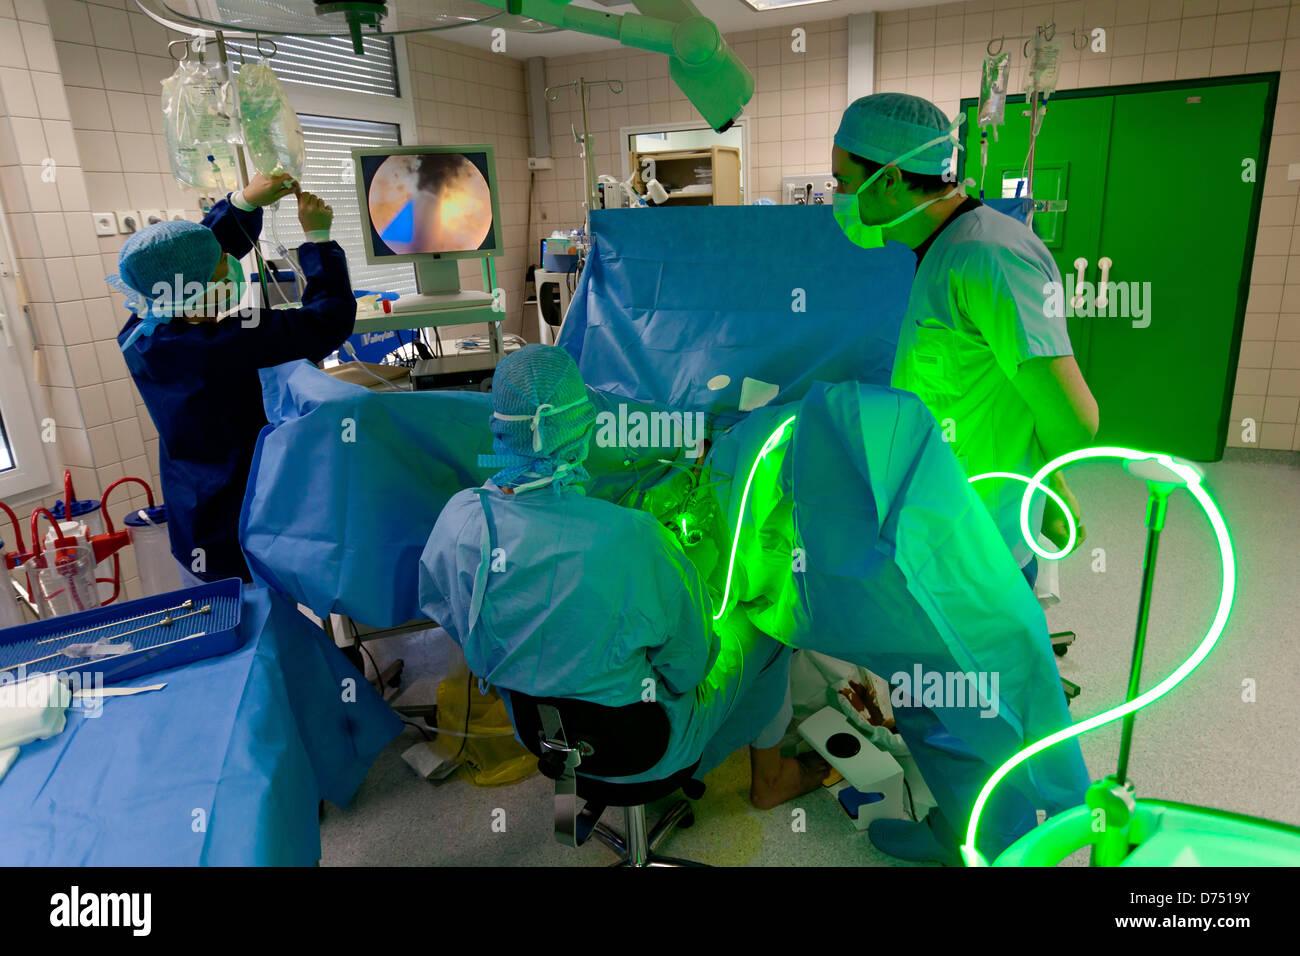 Treatment Benign Prostatic Hyperplasia (BPH) By Photoselective Vaporization  Prostate (PVP) Using Greenlight PV Laser System